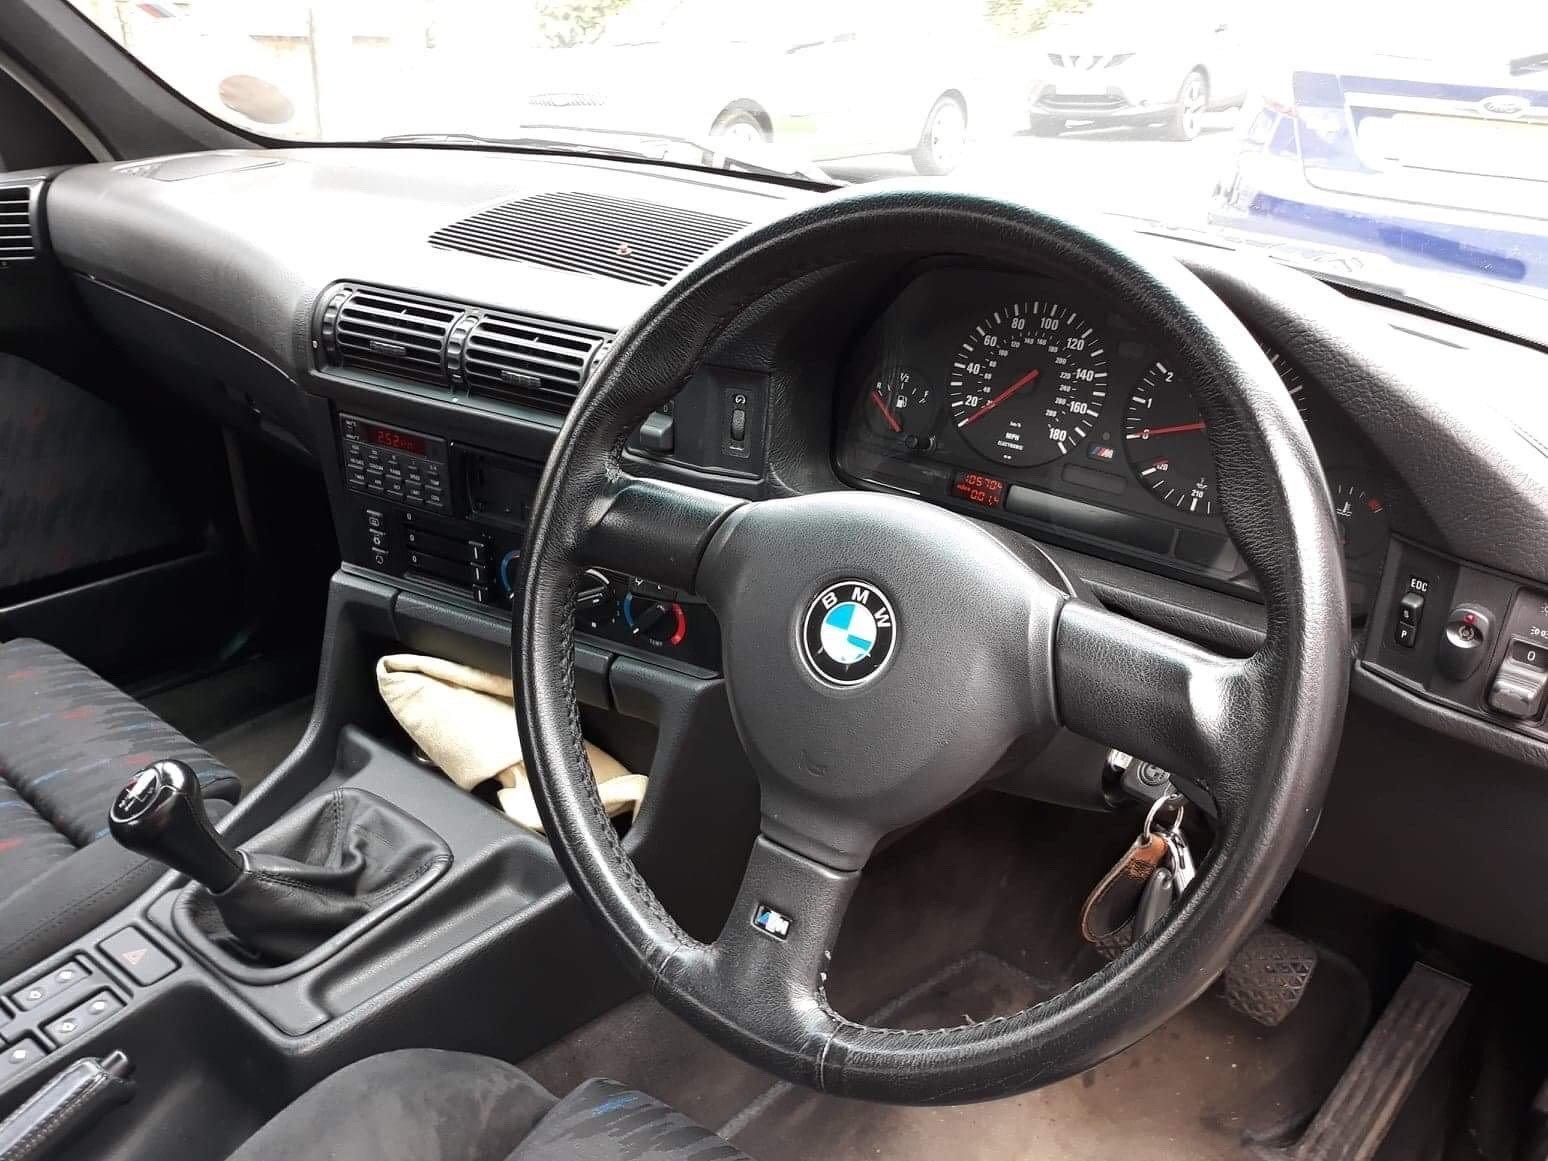 1993 E34 M5 3.8 For Sale (picture 4 of 6)